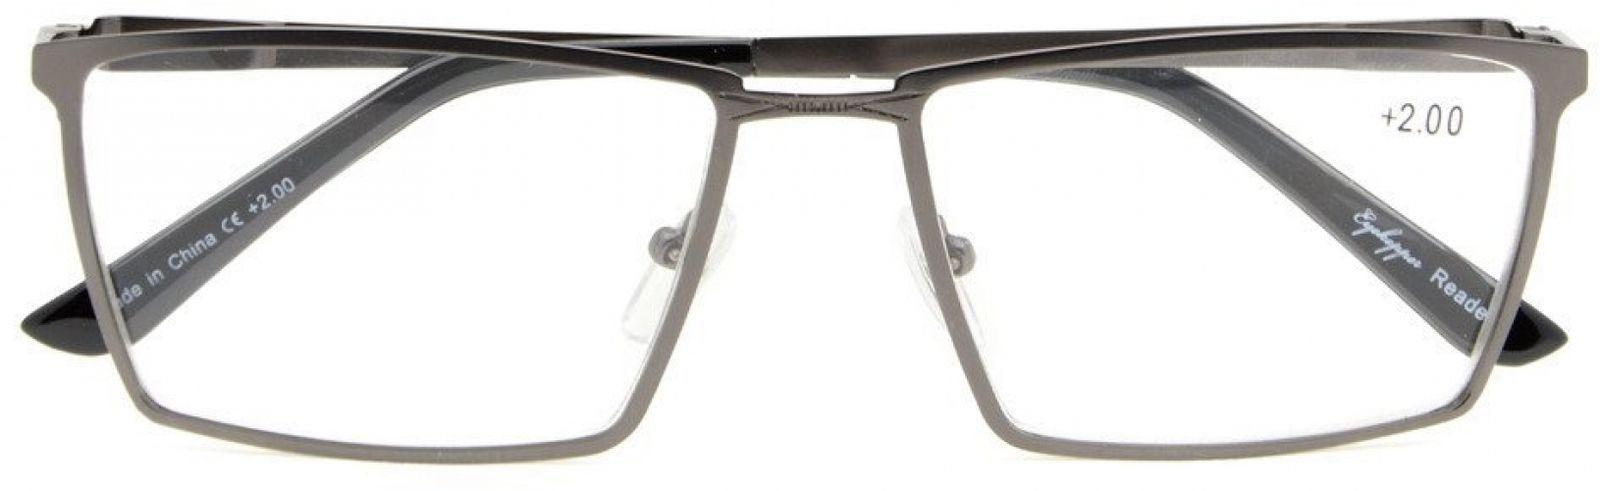 Eyekepper 4-Pack Mens Reading Glasses Spring Hinges Included Tinted Lens +0.75 image 3